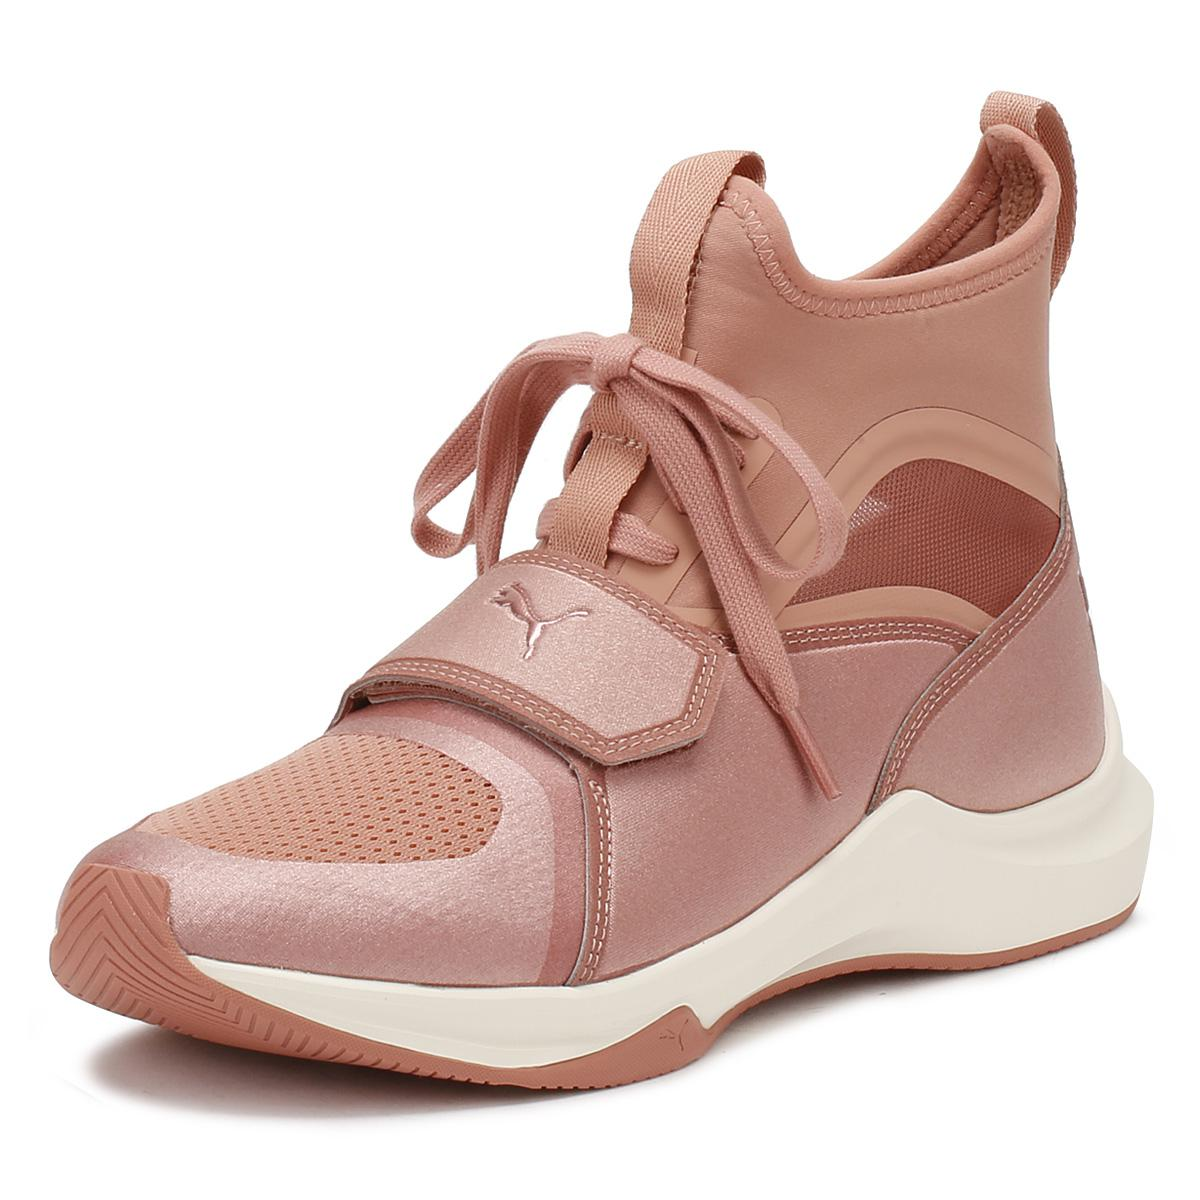 Save Womens Gomez Trainers Phenom Pink 6 Puma In Selena Lyst CFx71w8nq5